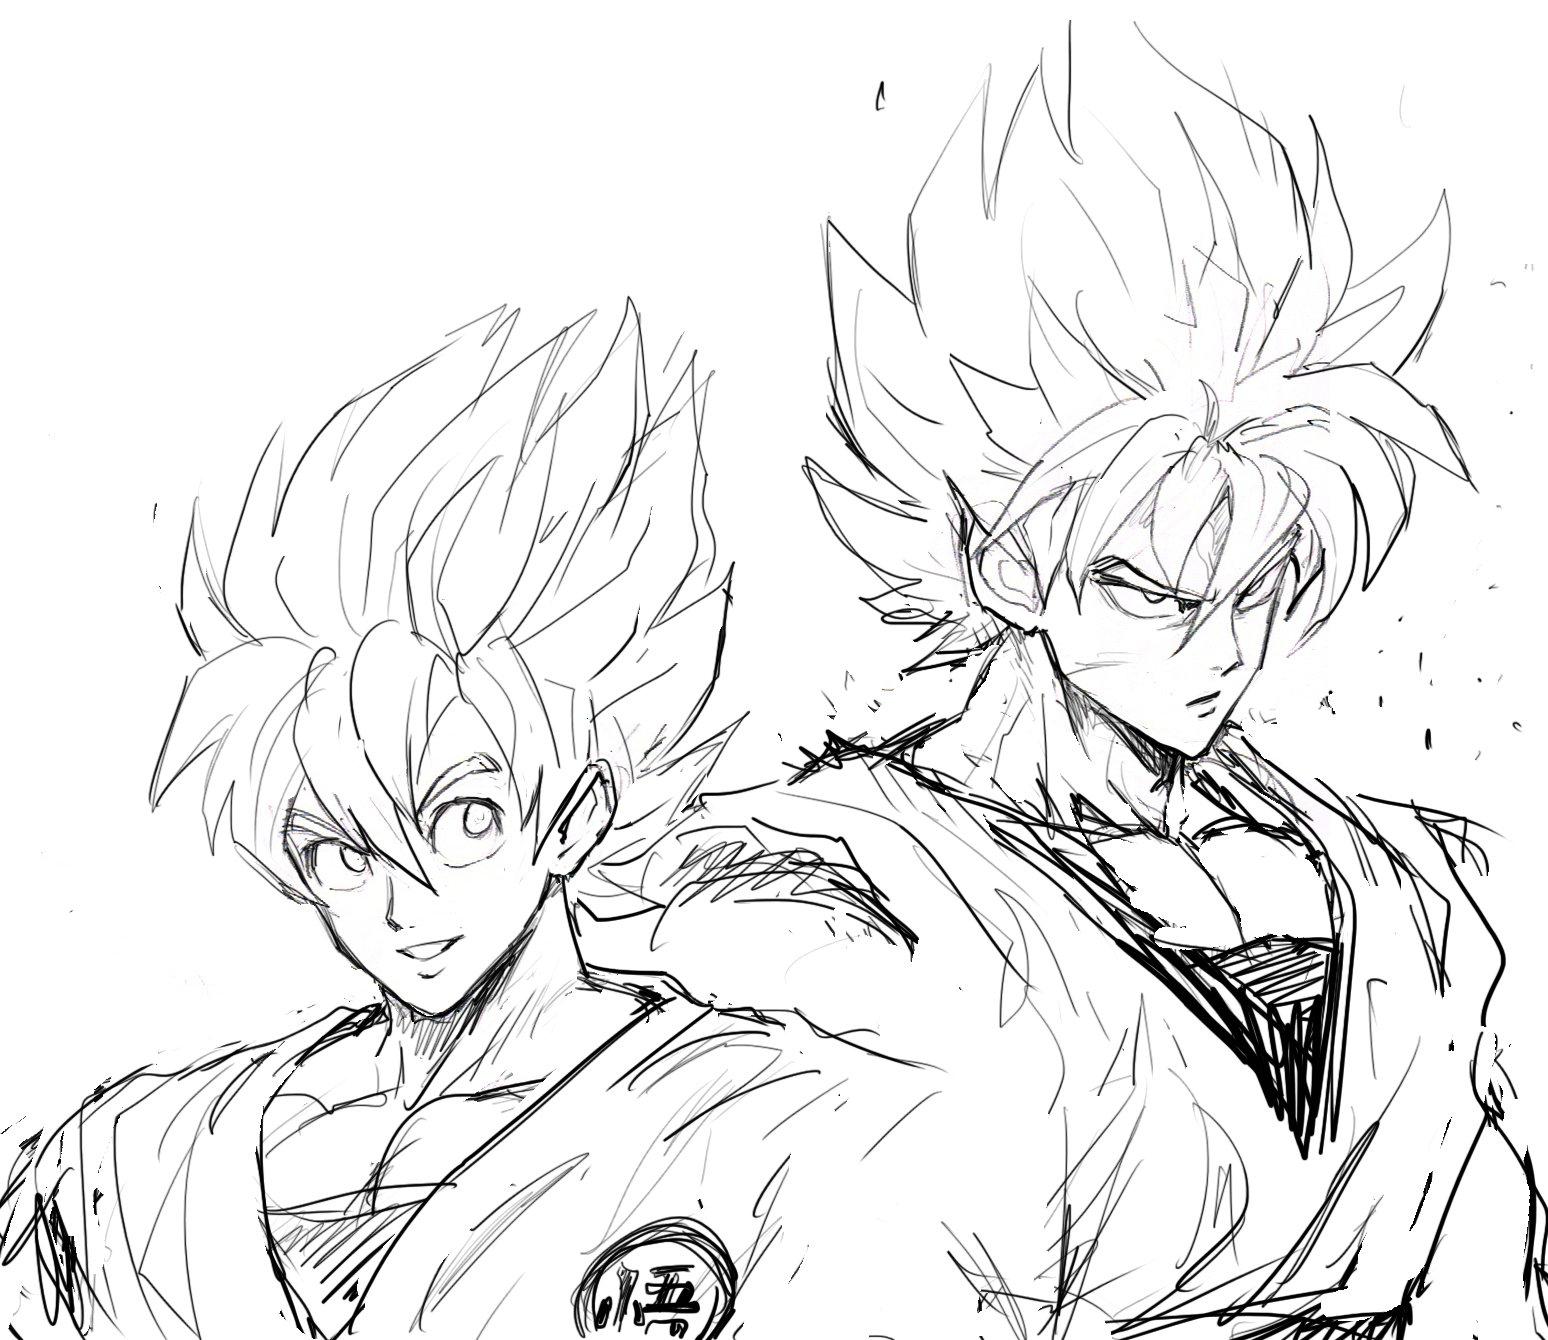 Goku par Yusuke Murata (One Punch Man) | DragonBall , Z , GT, Kai ...